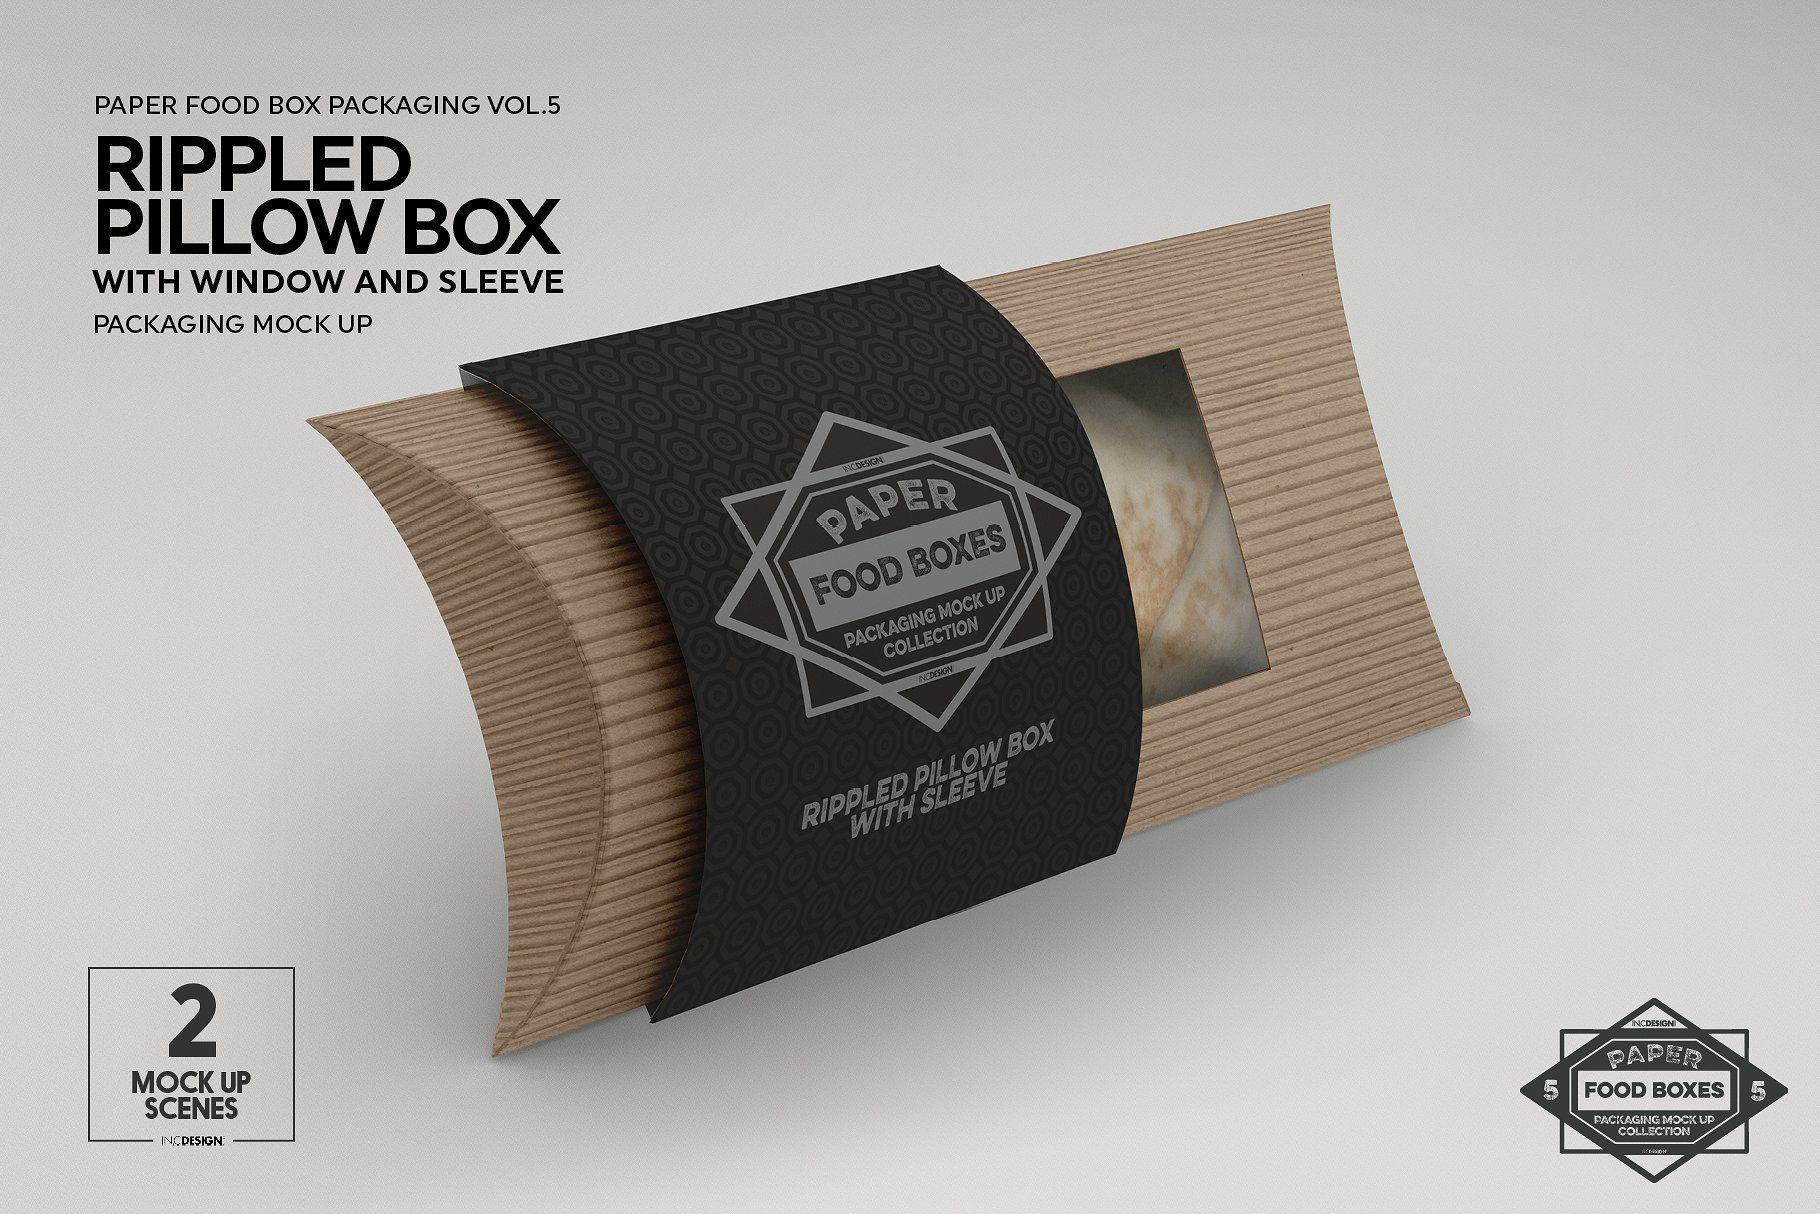 Download Vol 5 Food Box Packaging Mockups Food Box Packaging Pillow Box Packaging Mockup